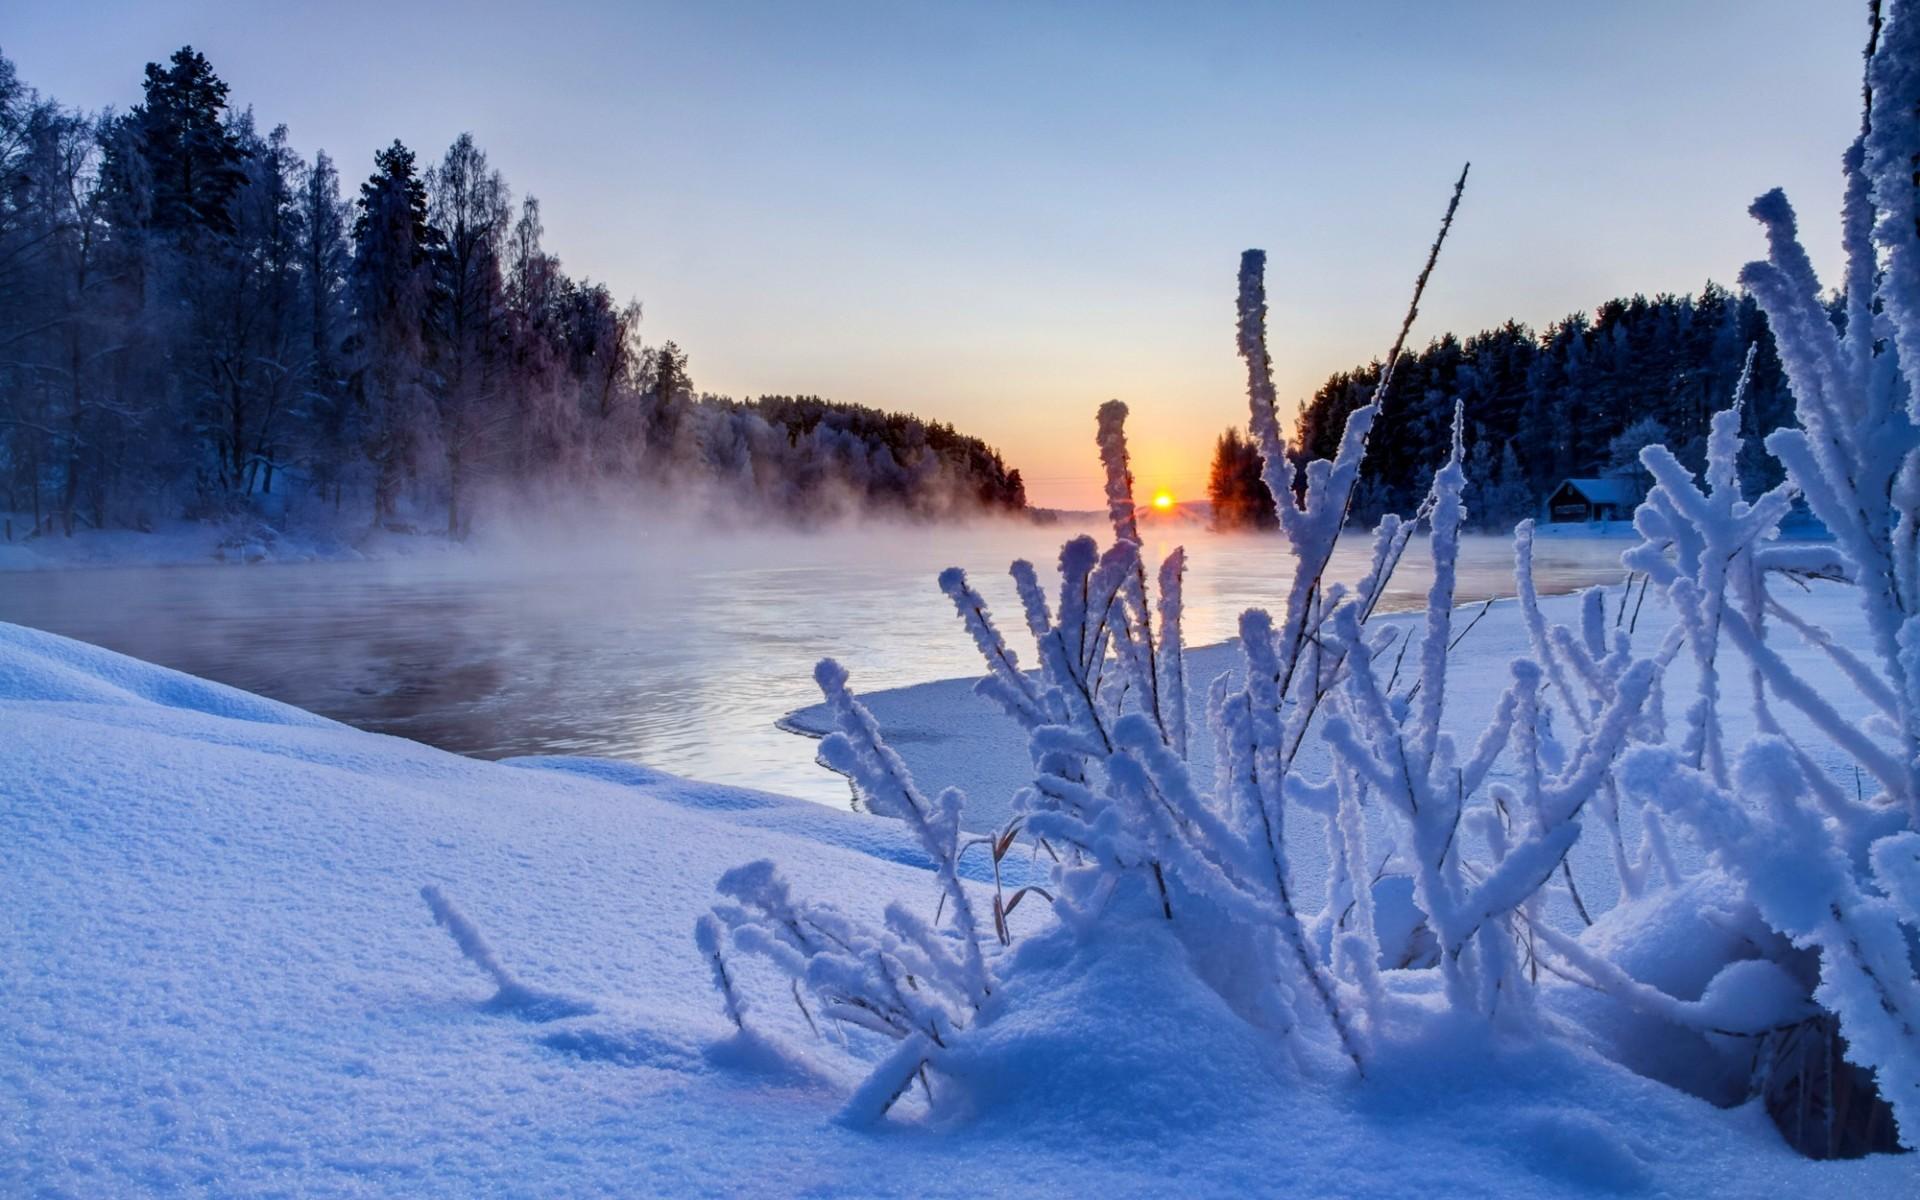 Winter hd widescreen wallpaper wallpapersafari - Wallpaper hd nature winter ...